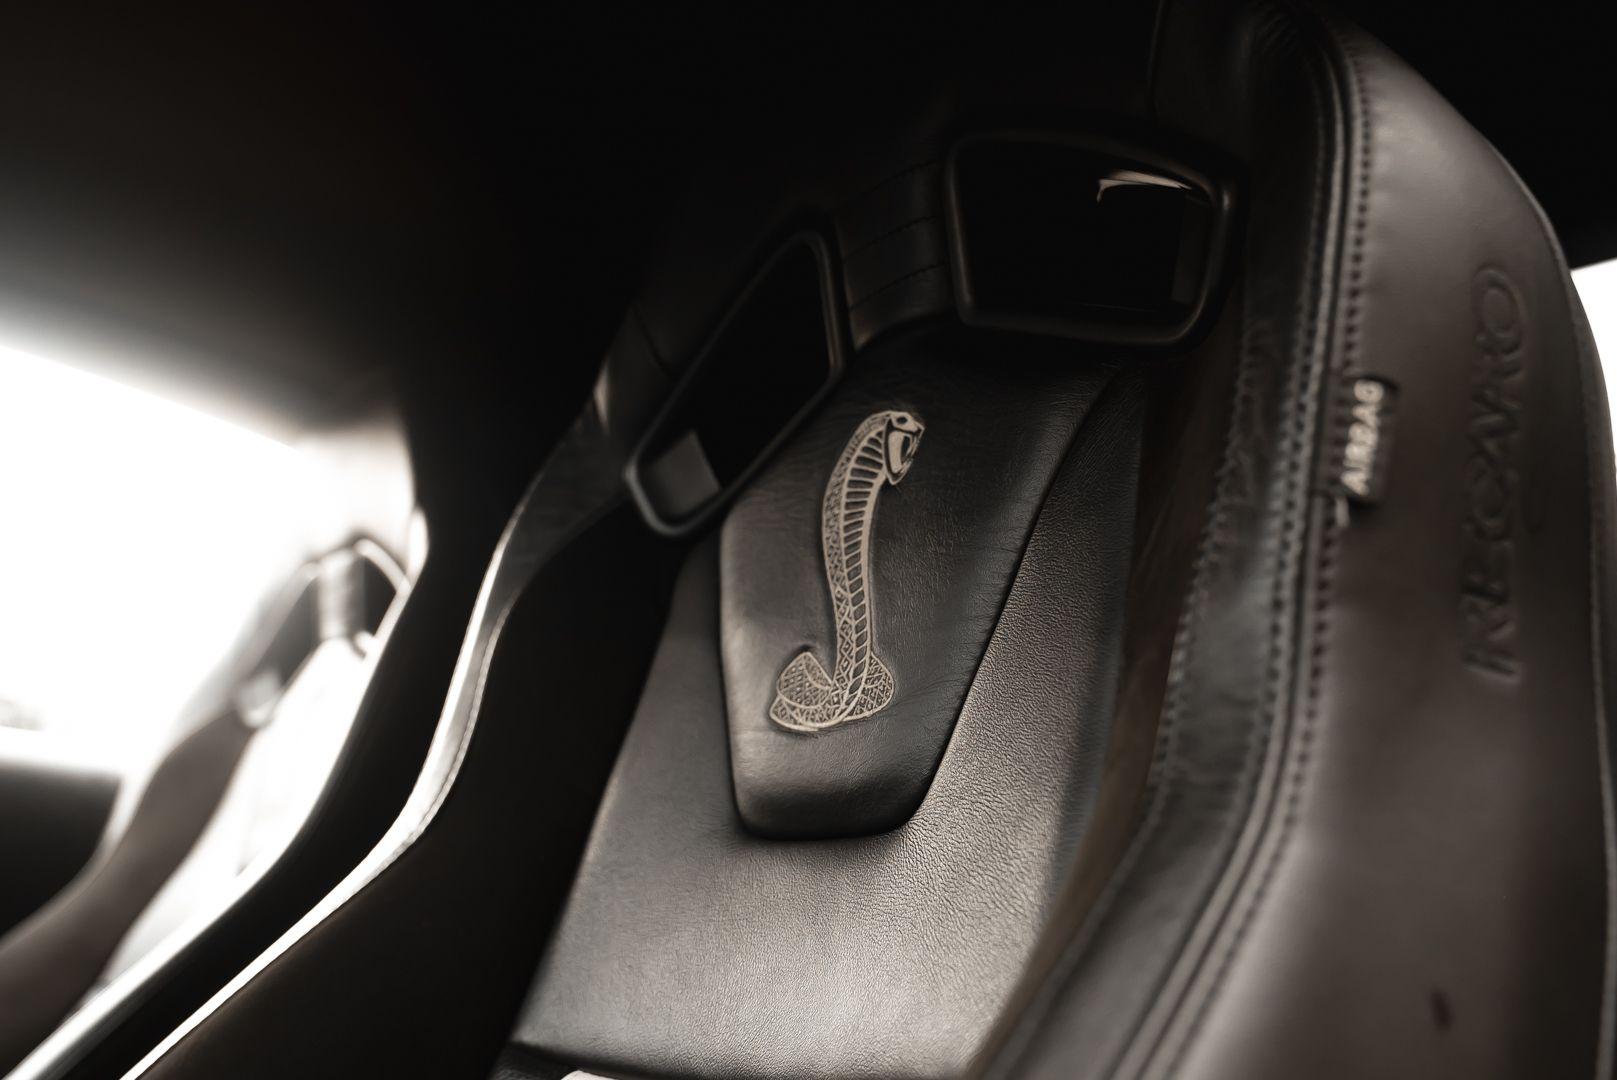 2012 Ford Mustang 5.0 V8 82095